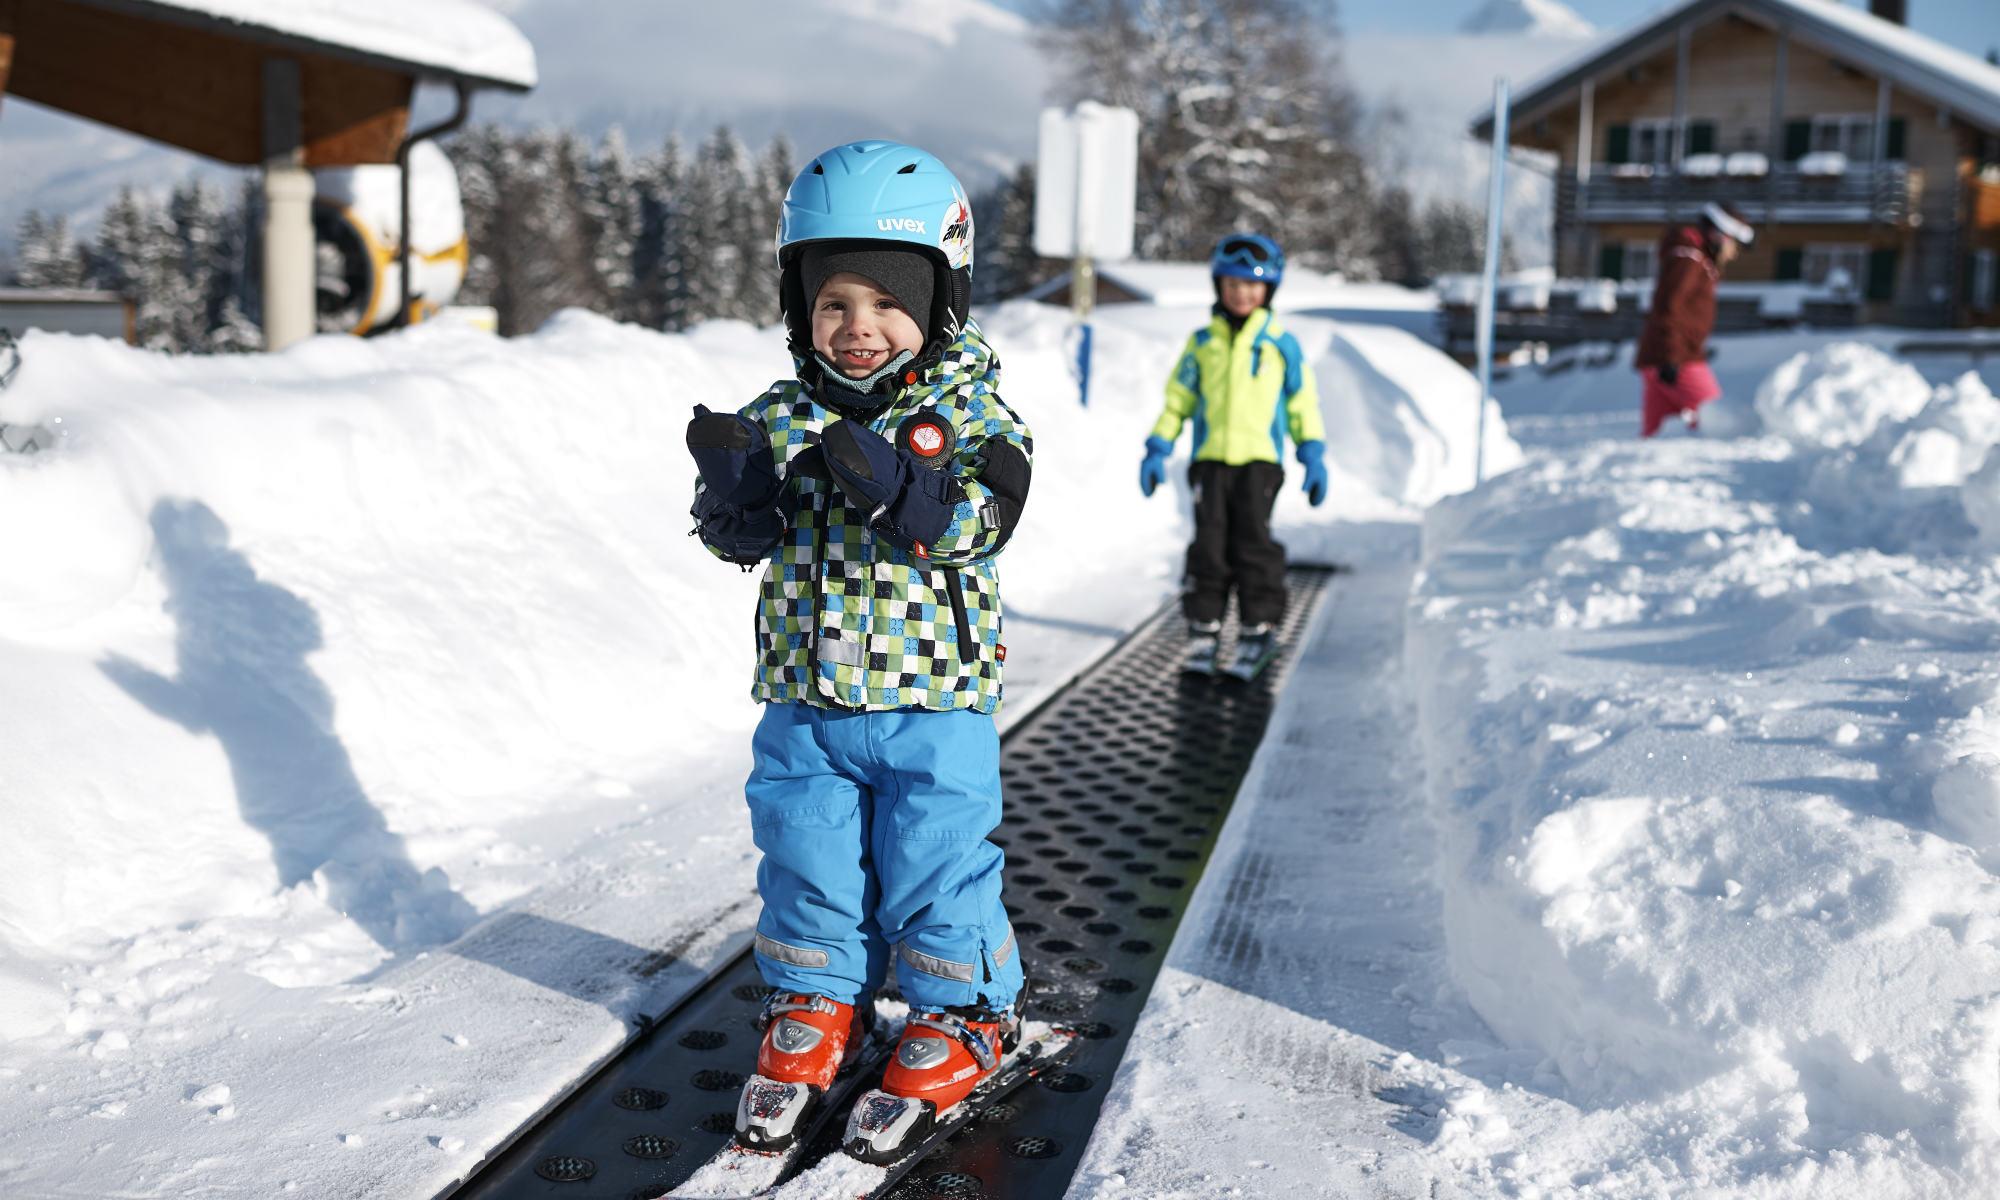 Kinder auf dem Förderband im Kinderland Söllis Winterwelt im Skigebiet Oberstdorf.